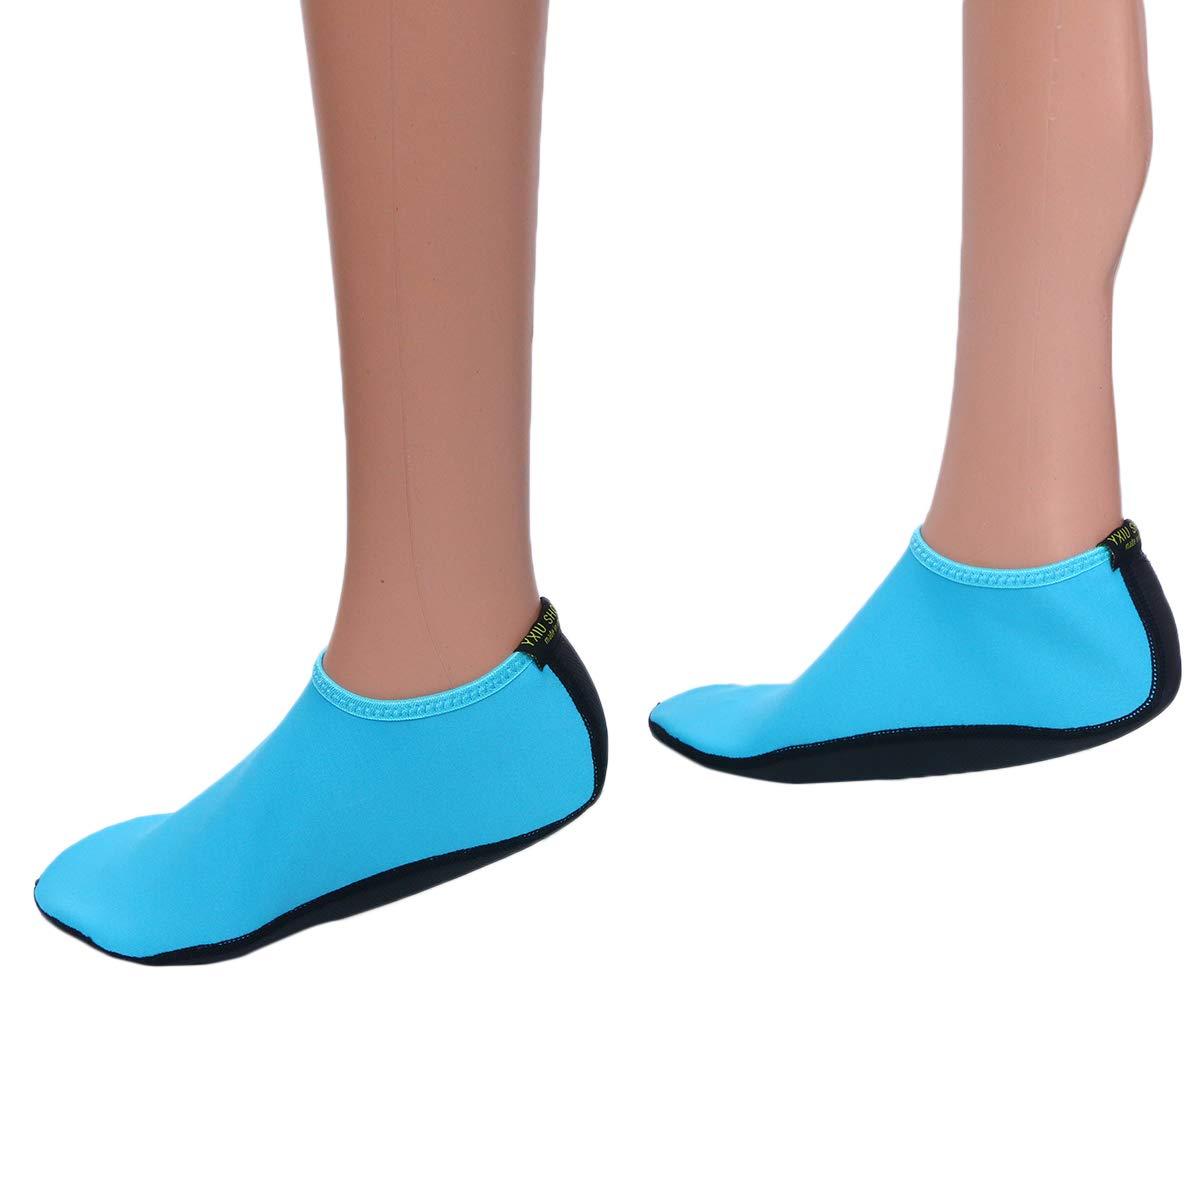 Black M//36-37 LIOOBO Quick-Dry Water Shoes Aqua Socks Lightweight Diving Socks Wetsuit Non-Slip Swim Beach for Men Women